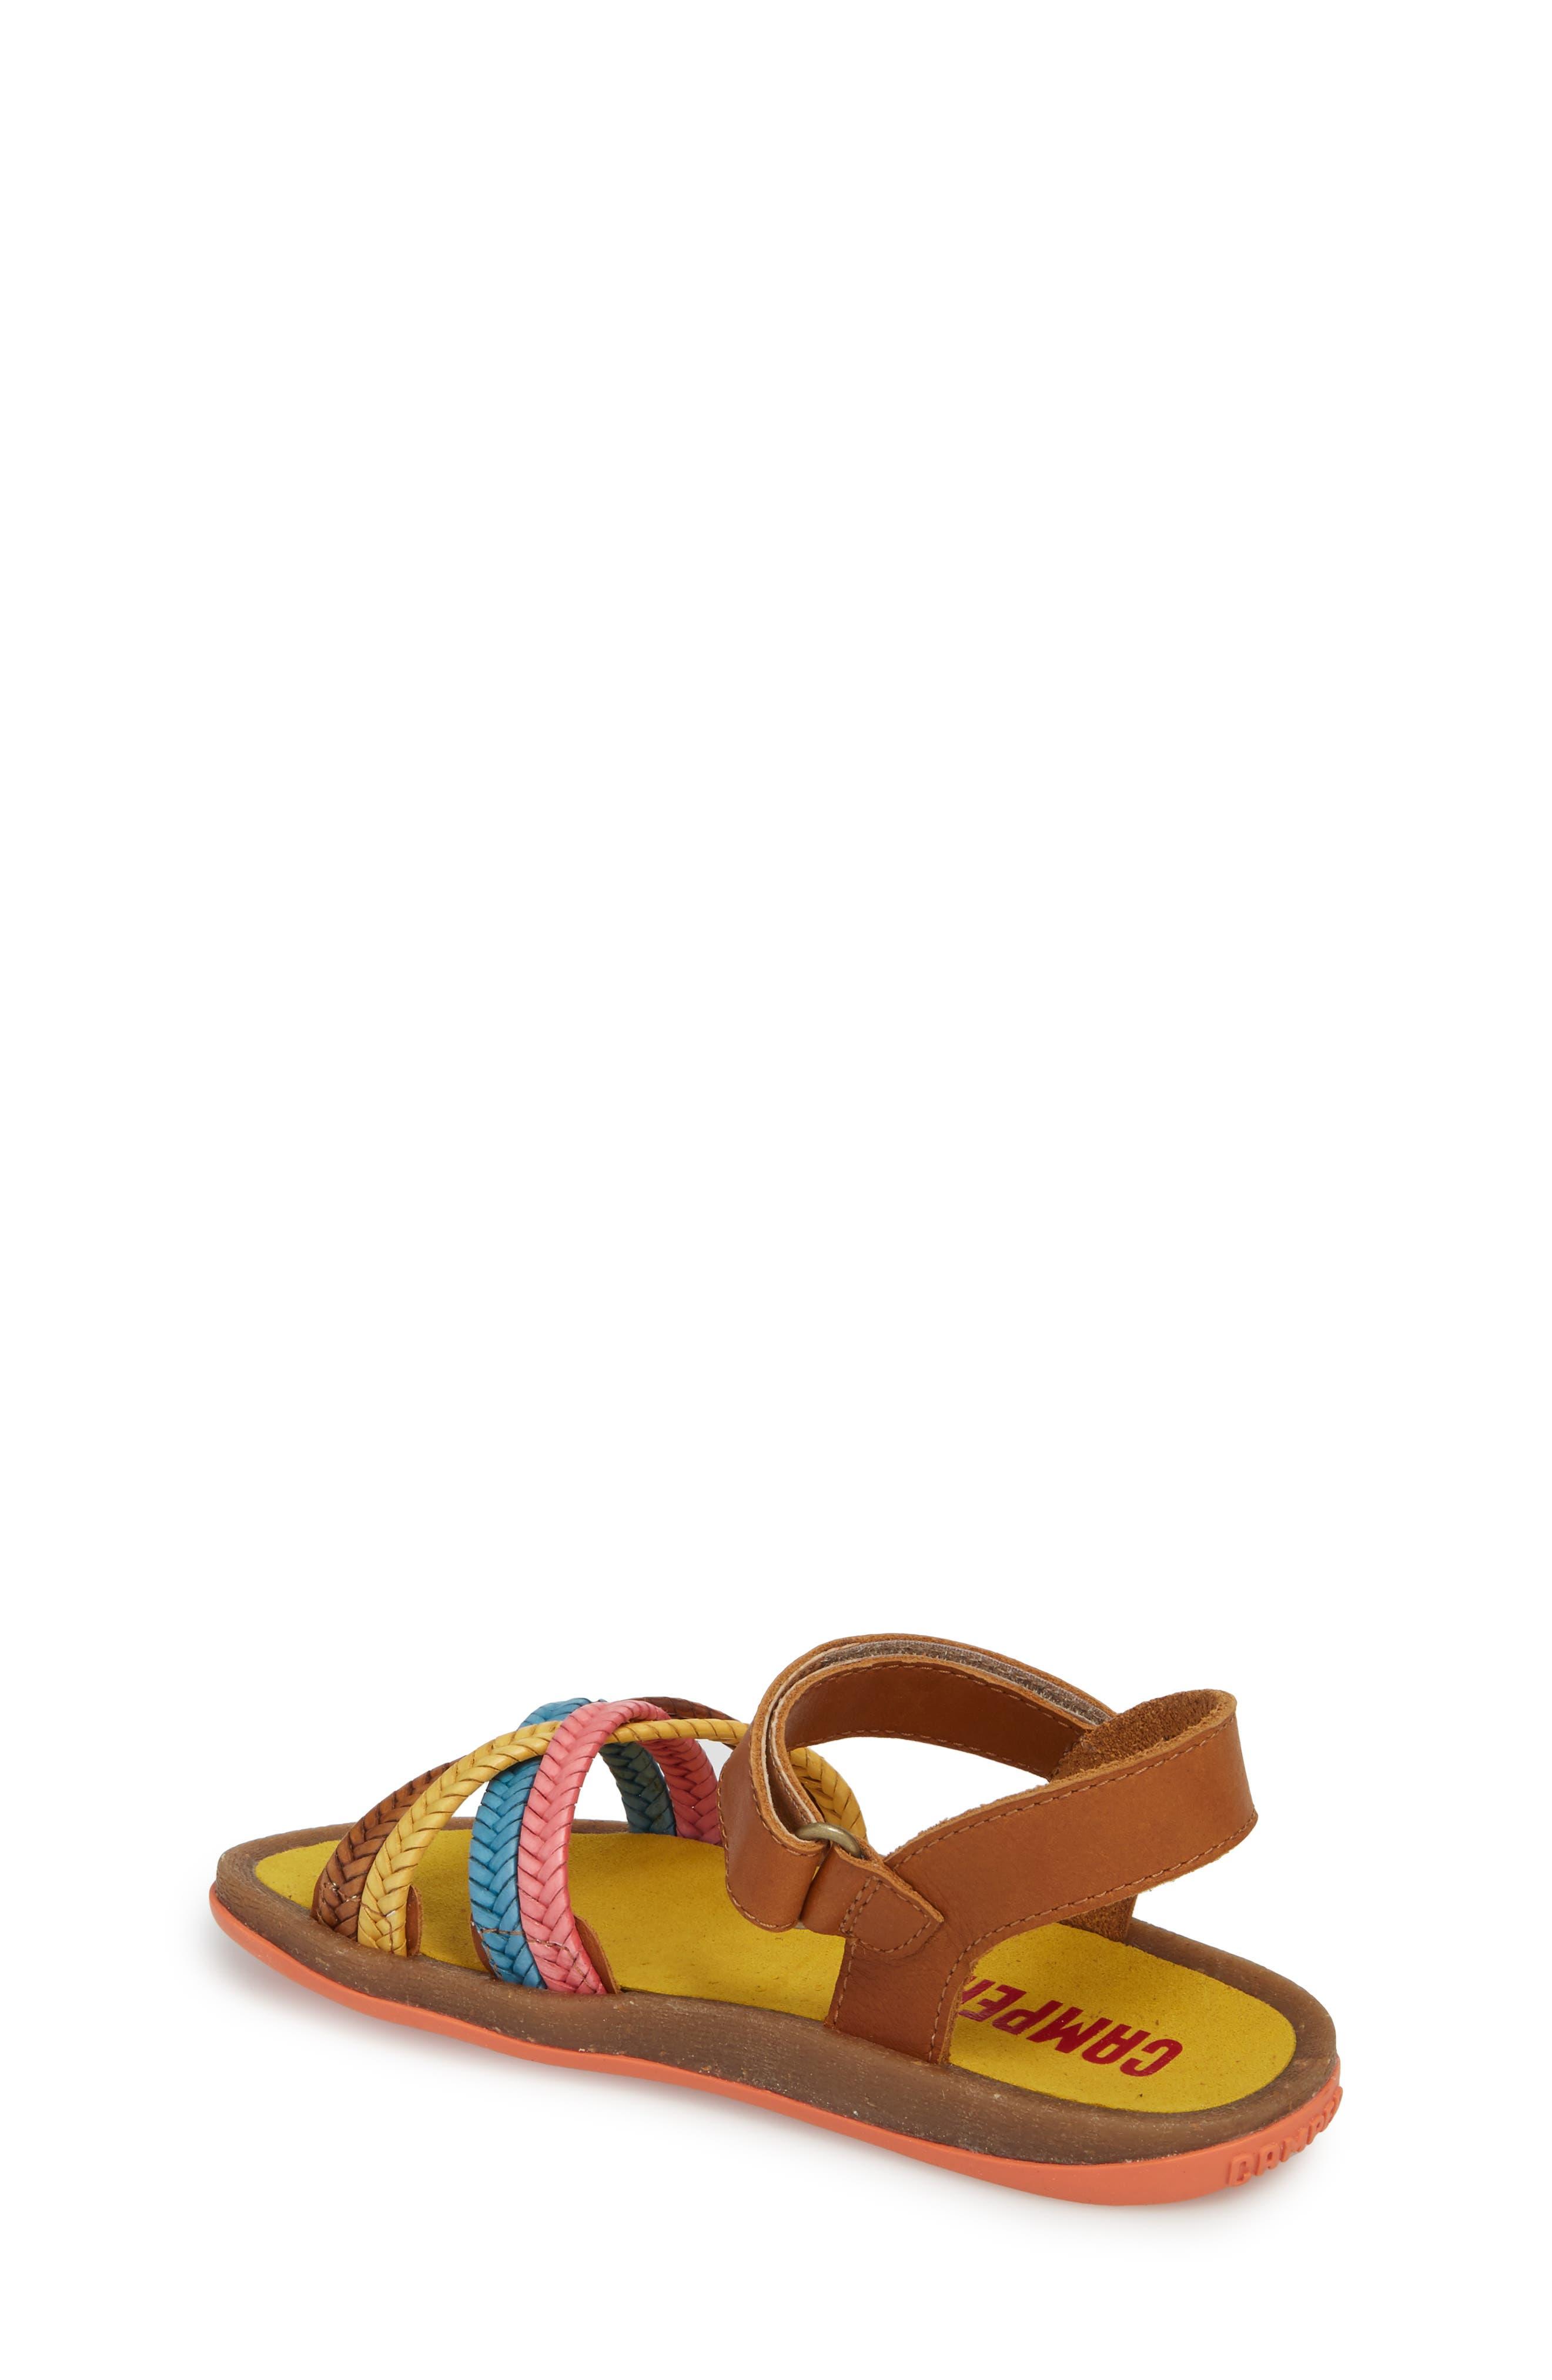 Bicho Braided Sandal,                             Alternate thumbnail 2, color,                             Multi